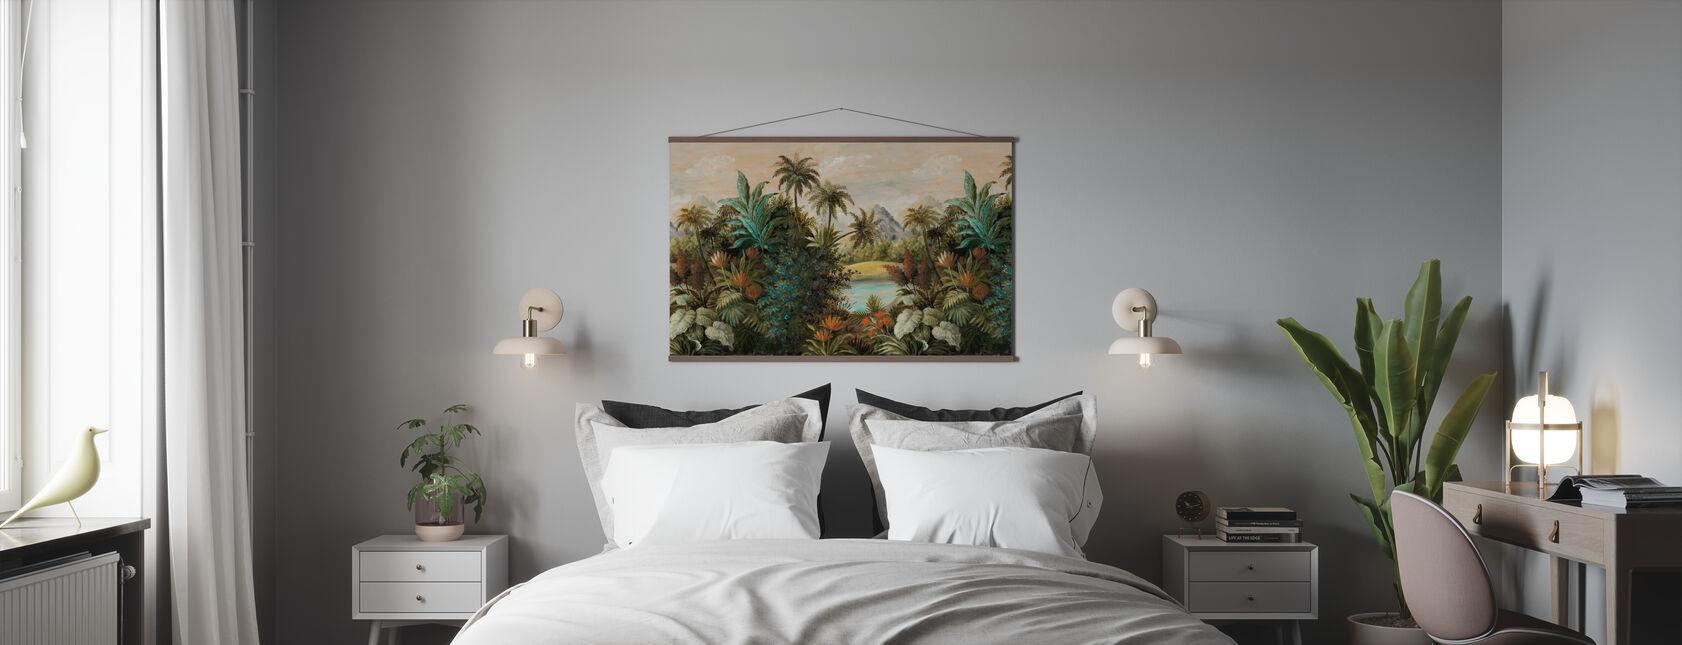 Divine Botanic - Poster - Bedroom